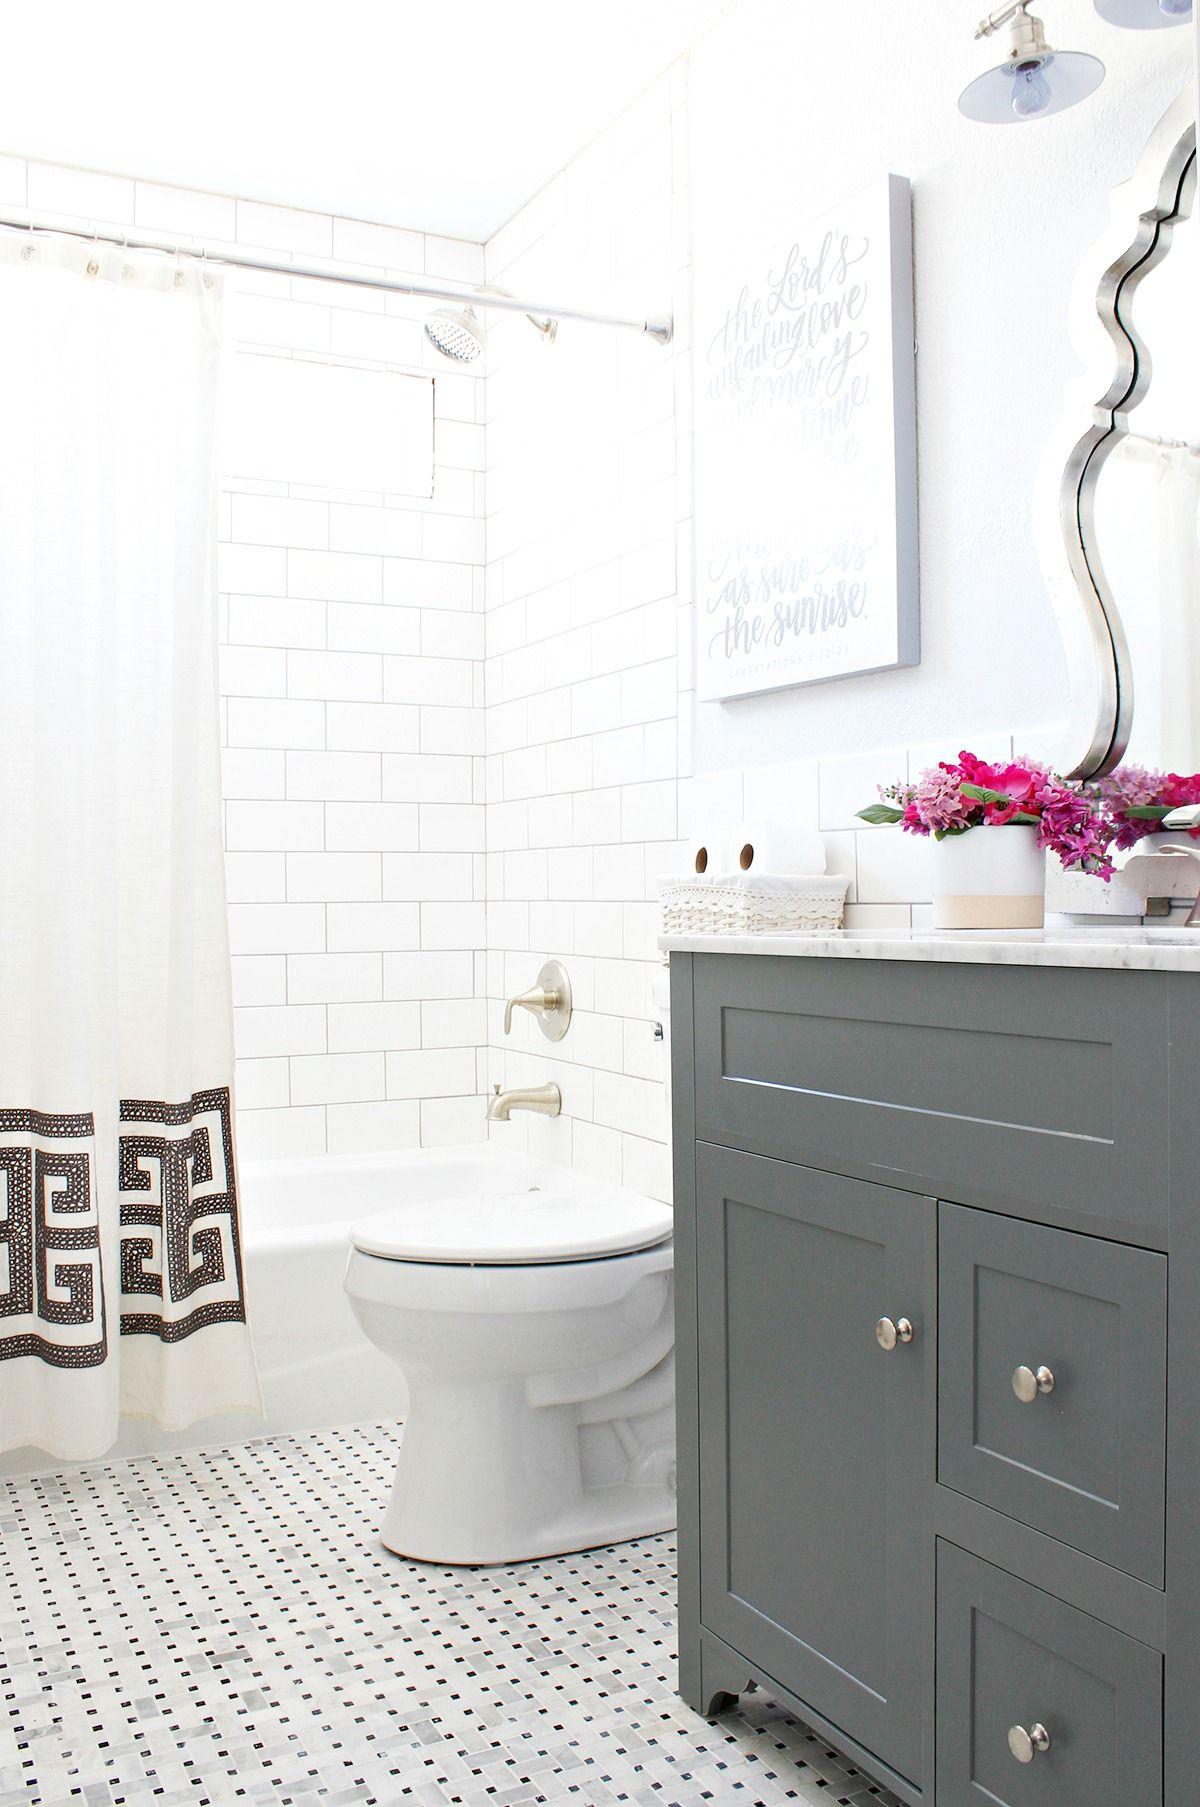 Kids Bathroom Reno Reveal + Pfister faucet review | Classy Clutter | Bloglovin'